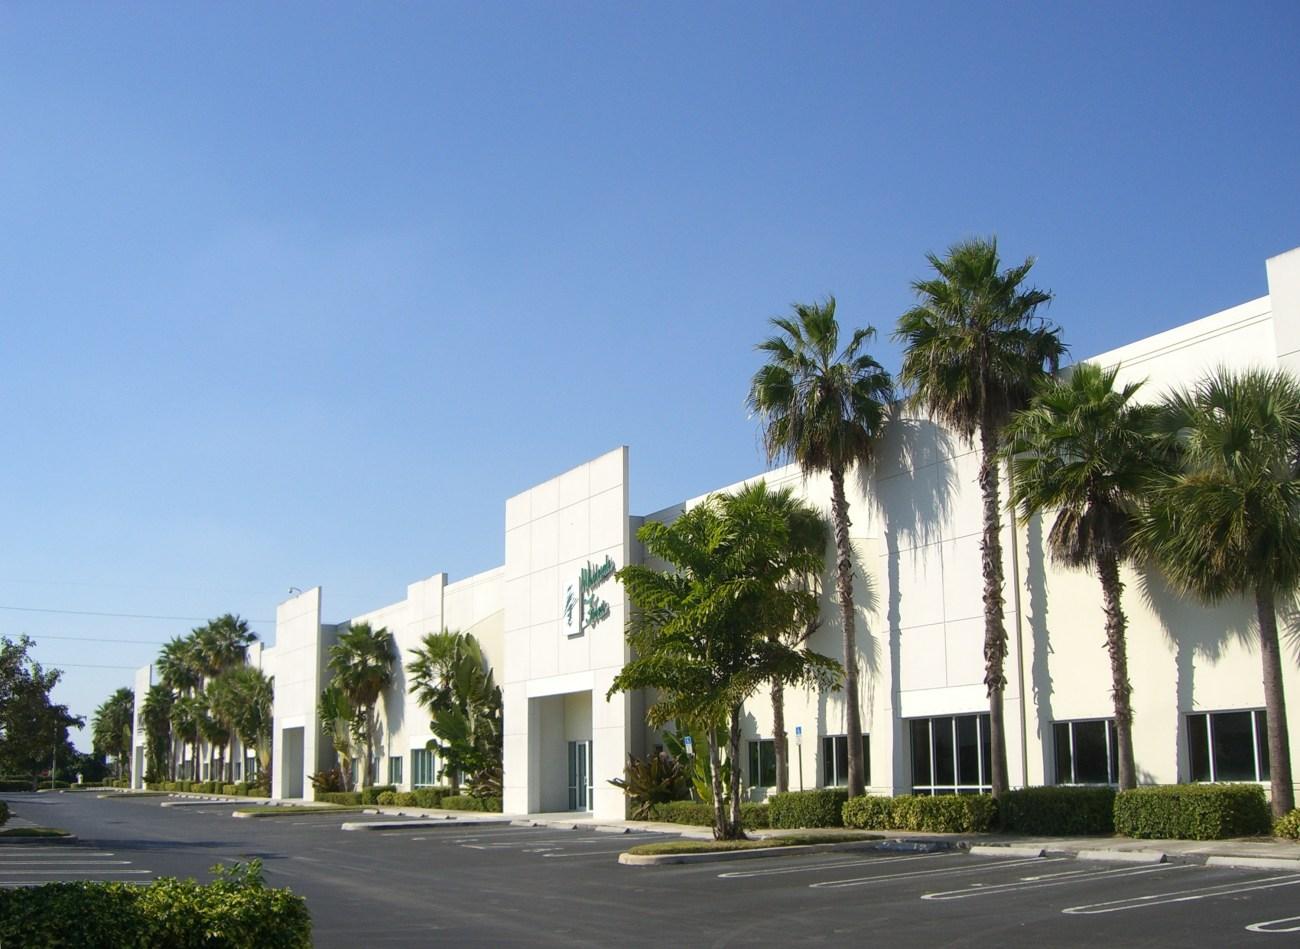 Cushman & Wakefield Negotiates 52,505-SF HQ Renewal with Quantachrome Instruments at Boynton Commerce Center